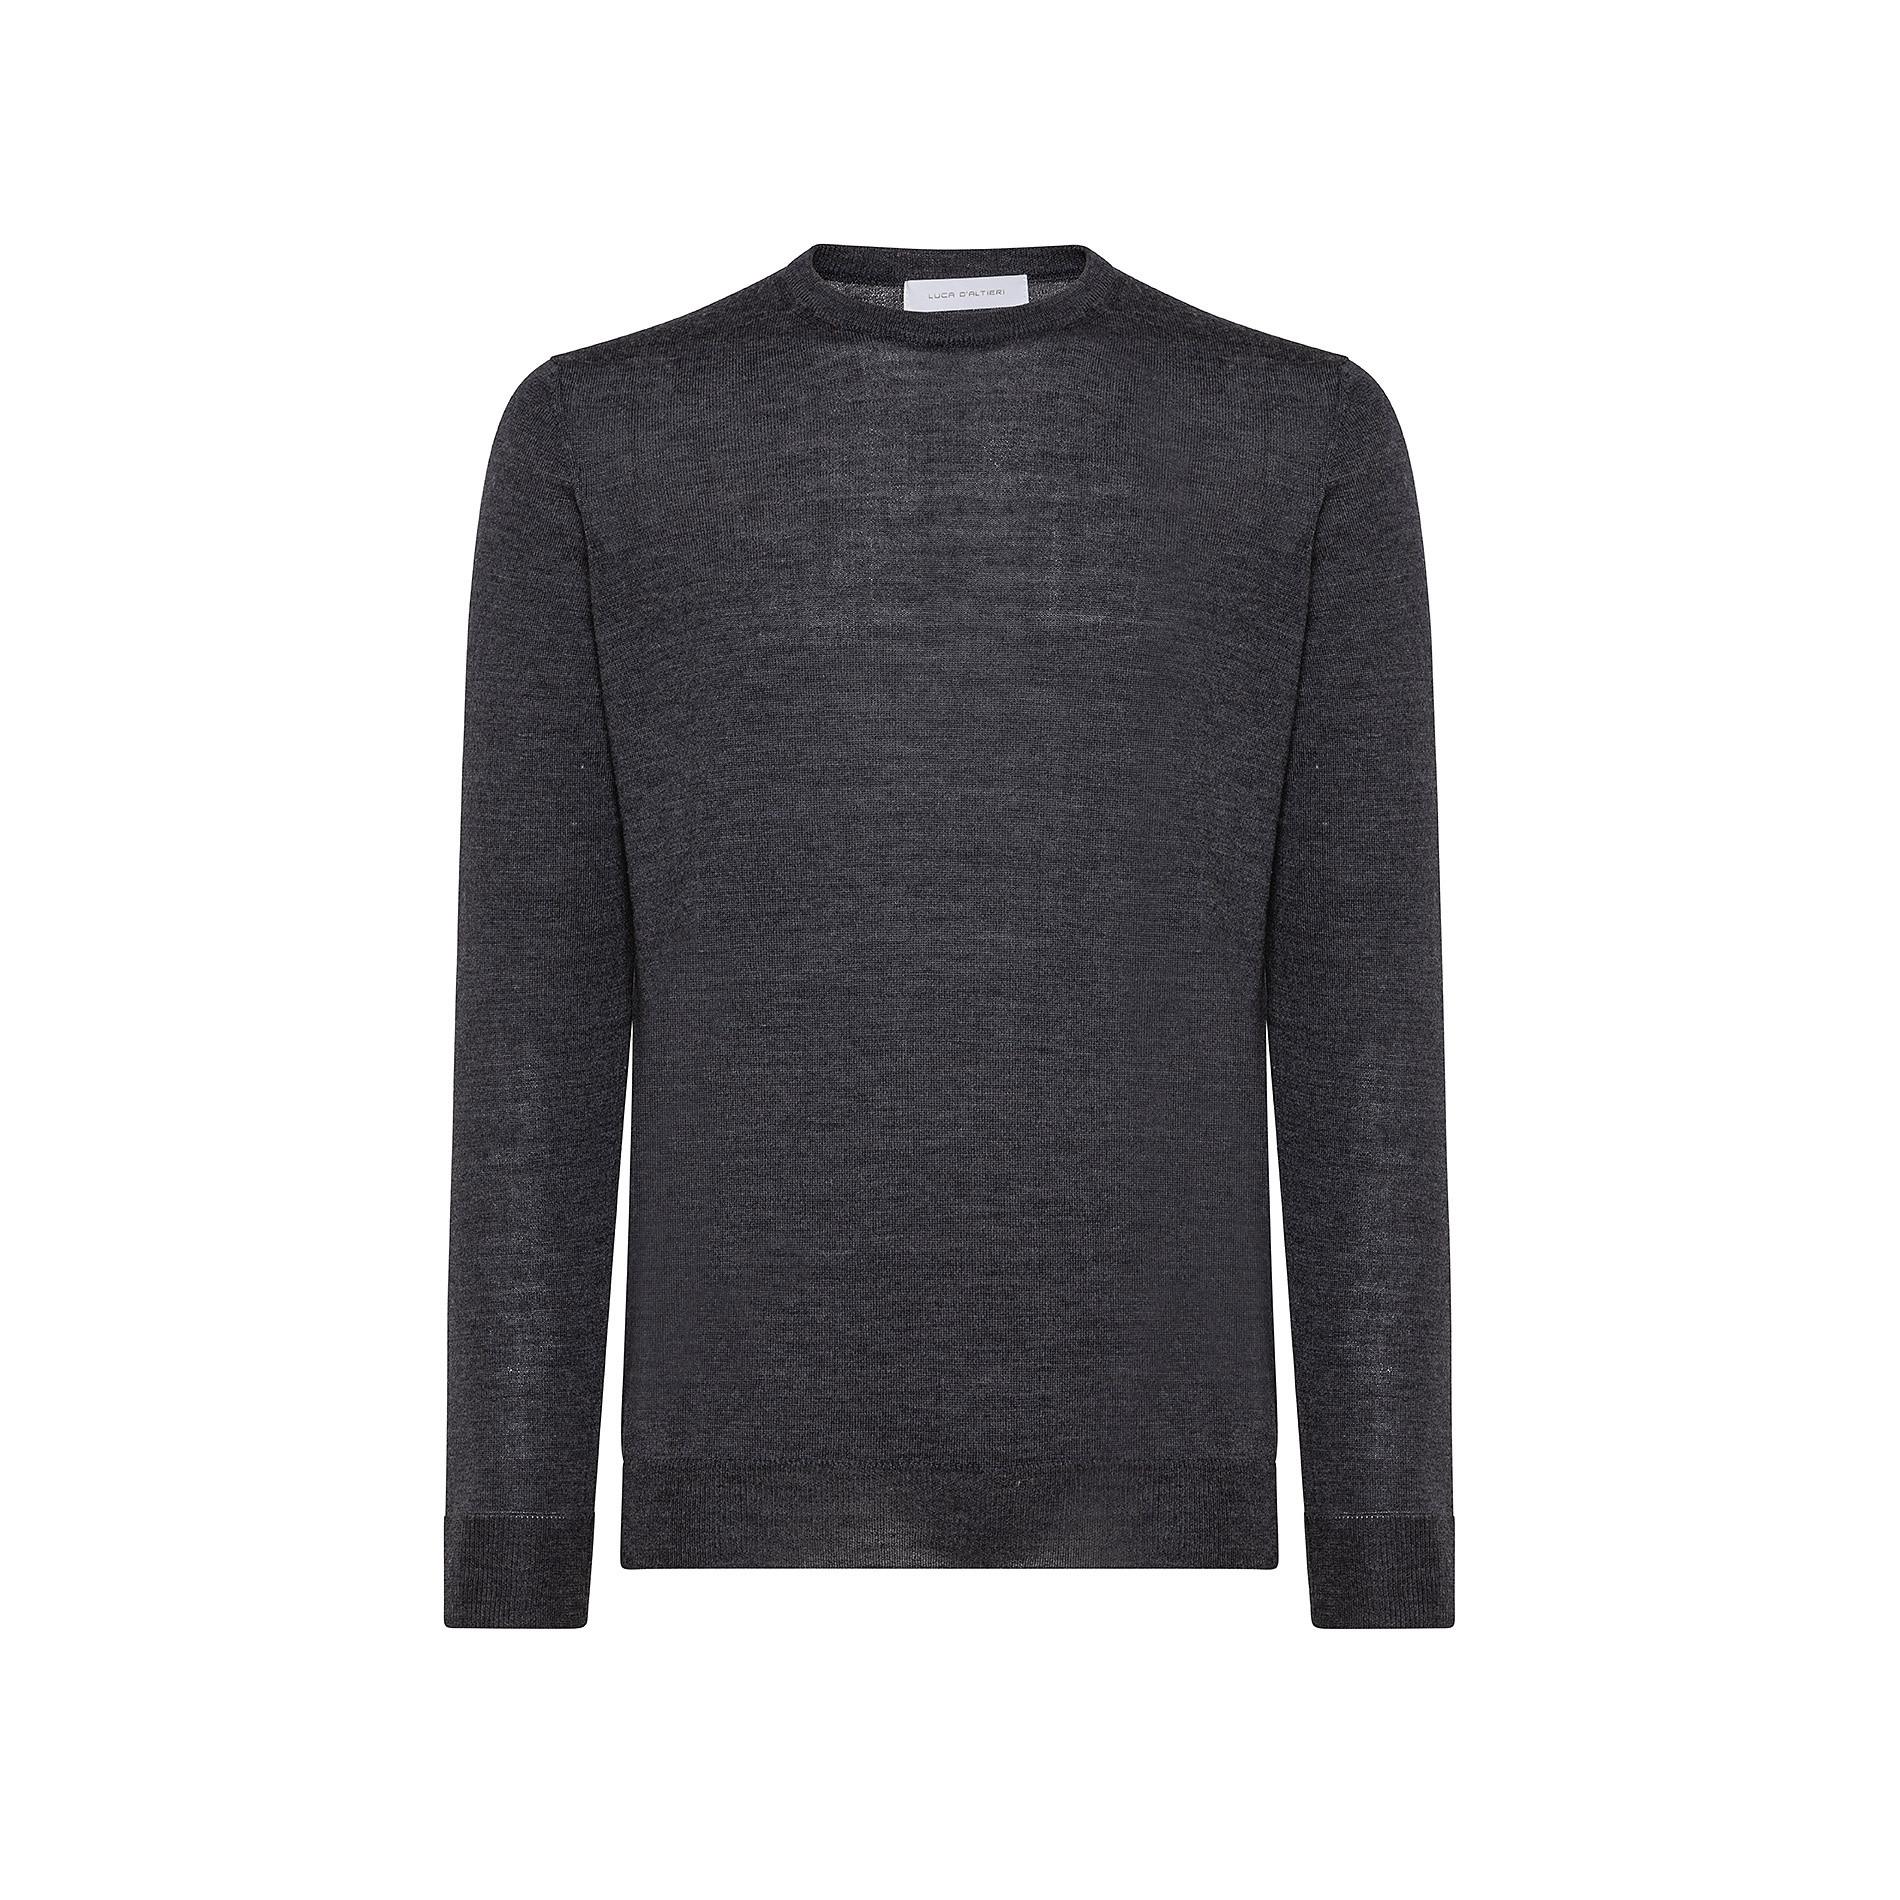 Pullover girocollo lana merinos extrafine, Grigio chiaro, large image number 0